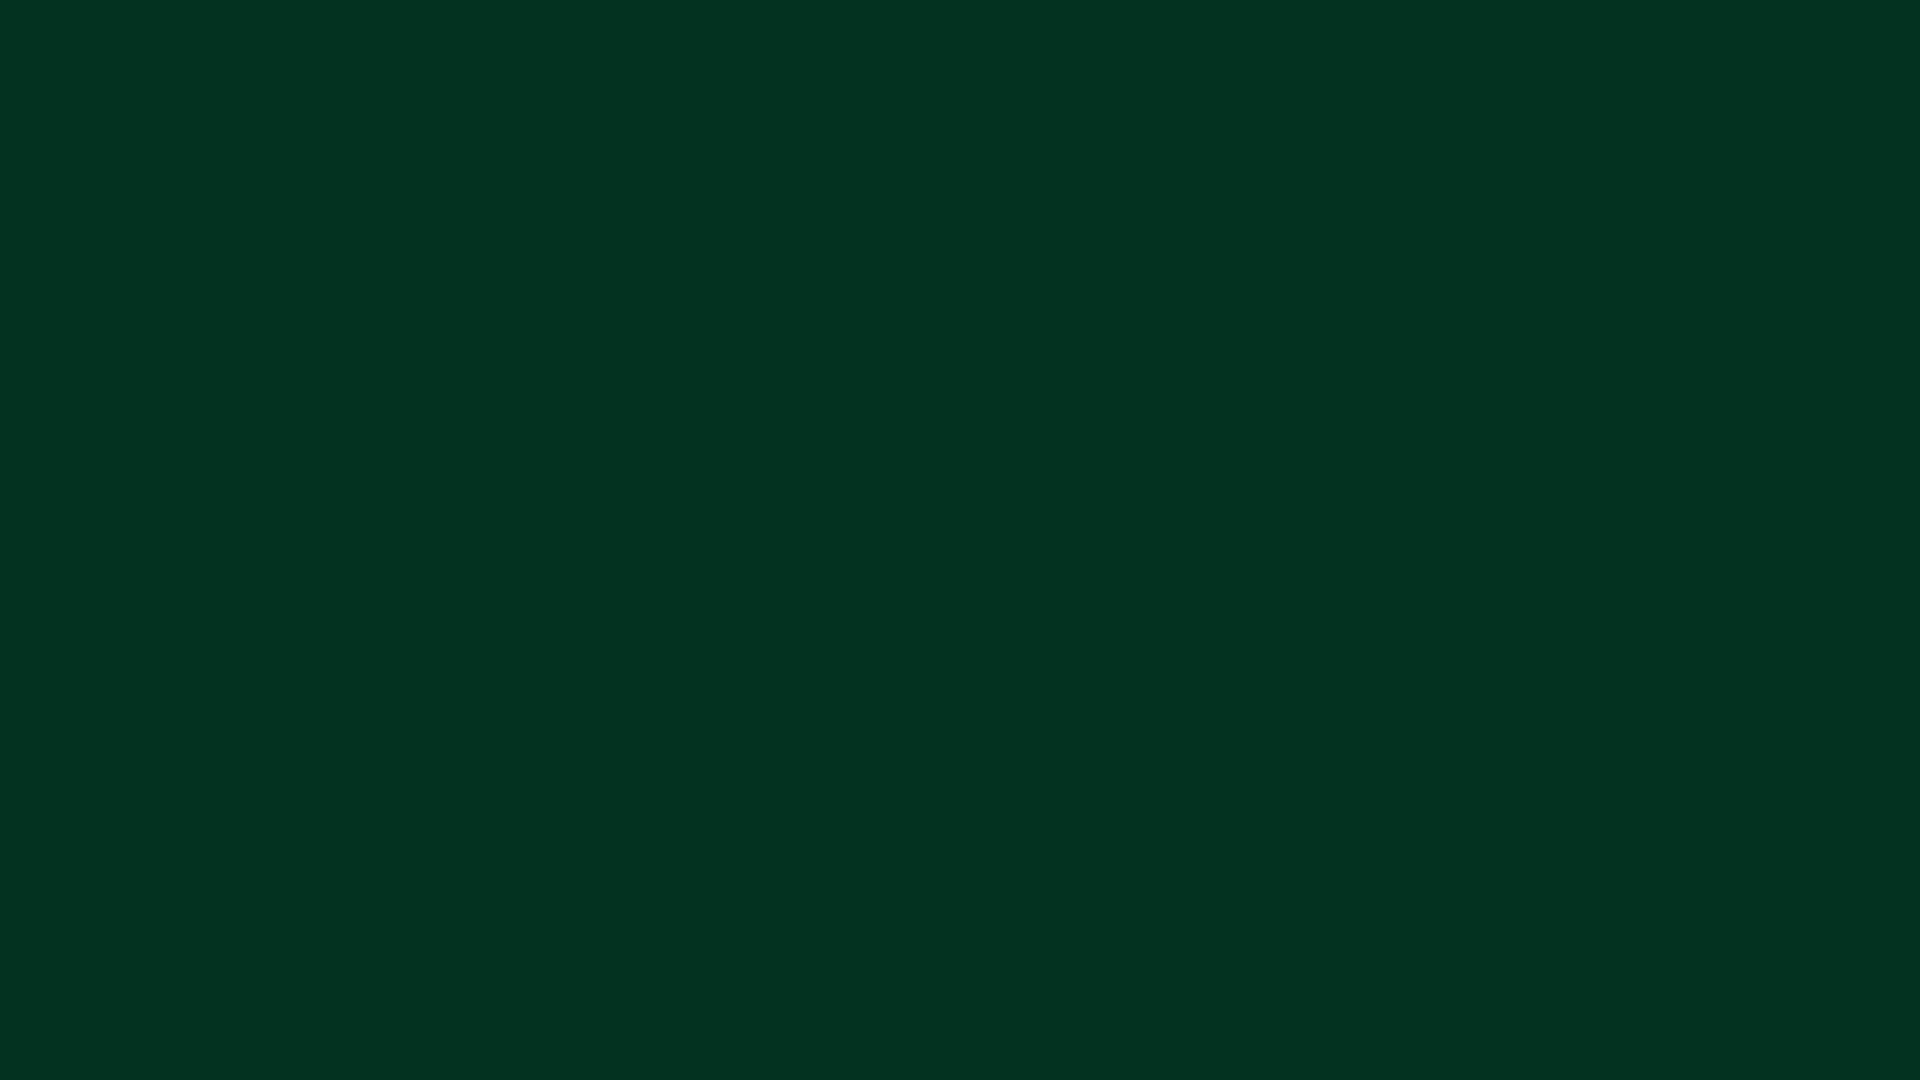 Dark Green Wallpaper Hd: Green Color Background Wallpaper